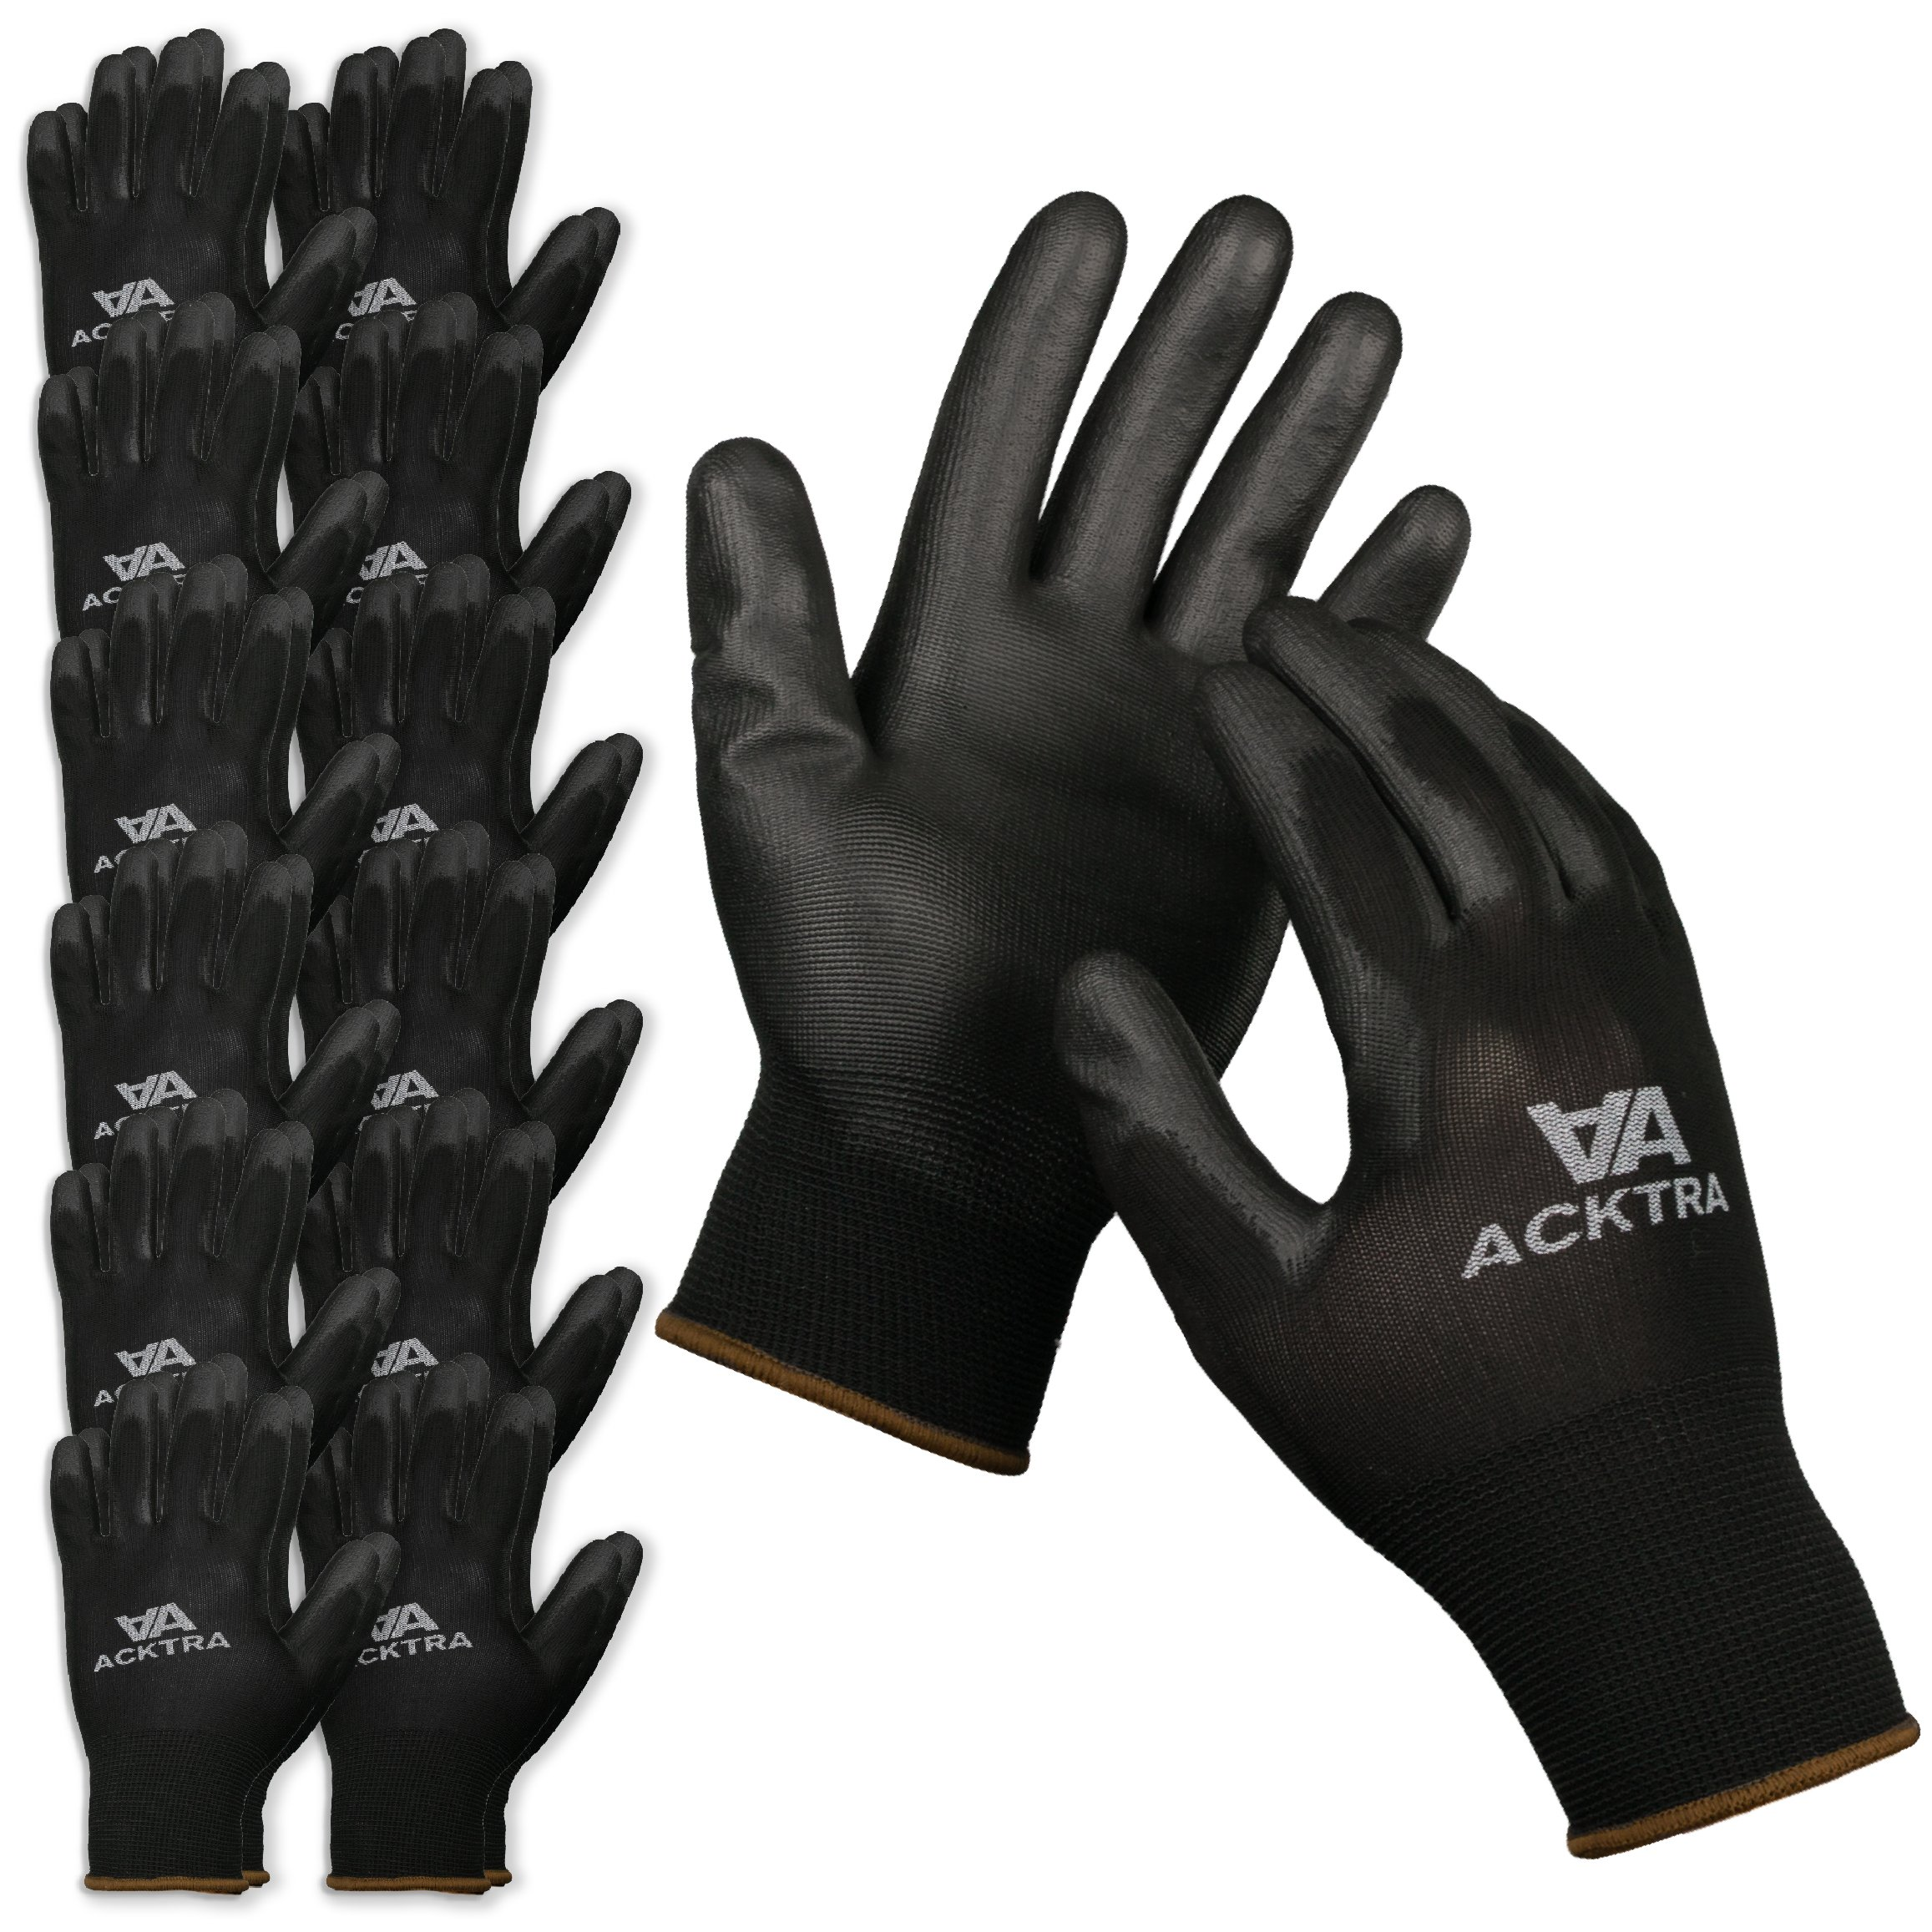 ACKTRA Ultra-Thin Polyurethane (PU) Coated Nylon WORK GLOVES 12 Pairs, Knit Wrist Cuff, for Precision Work, for Men & Women, WG002 Black Medium